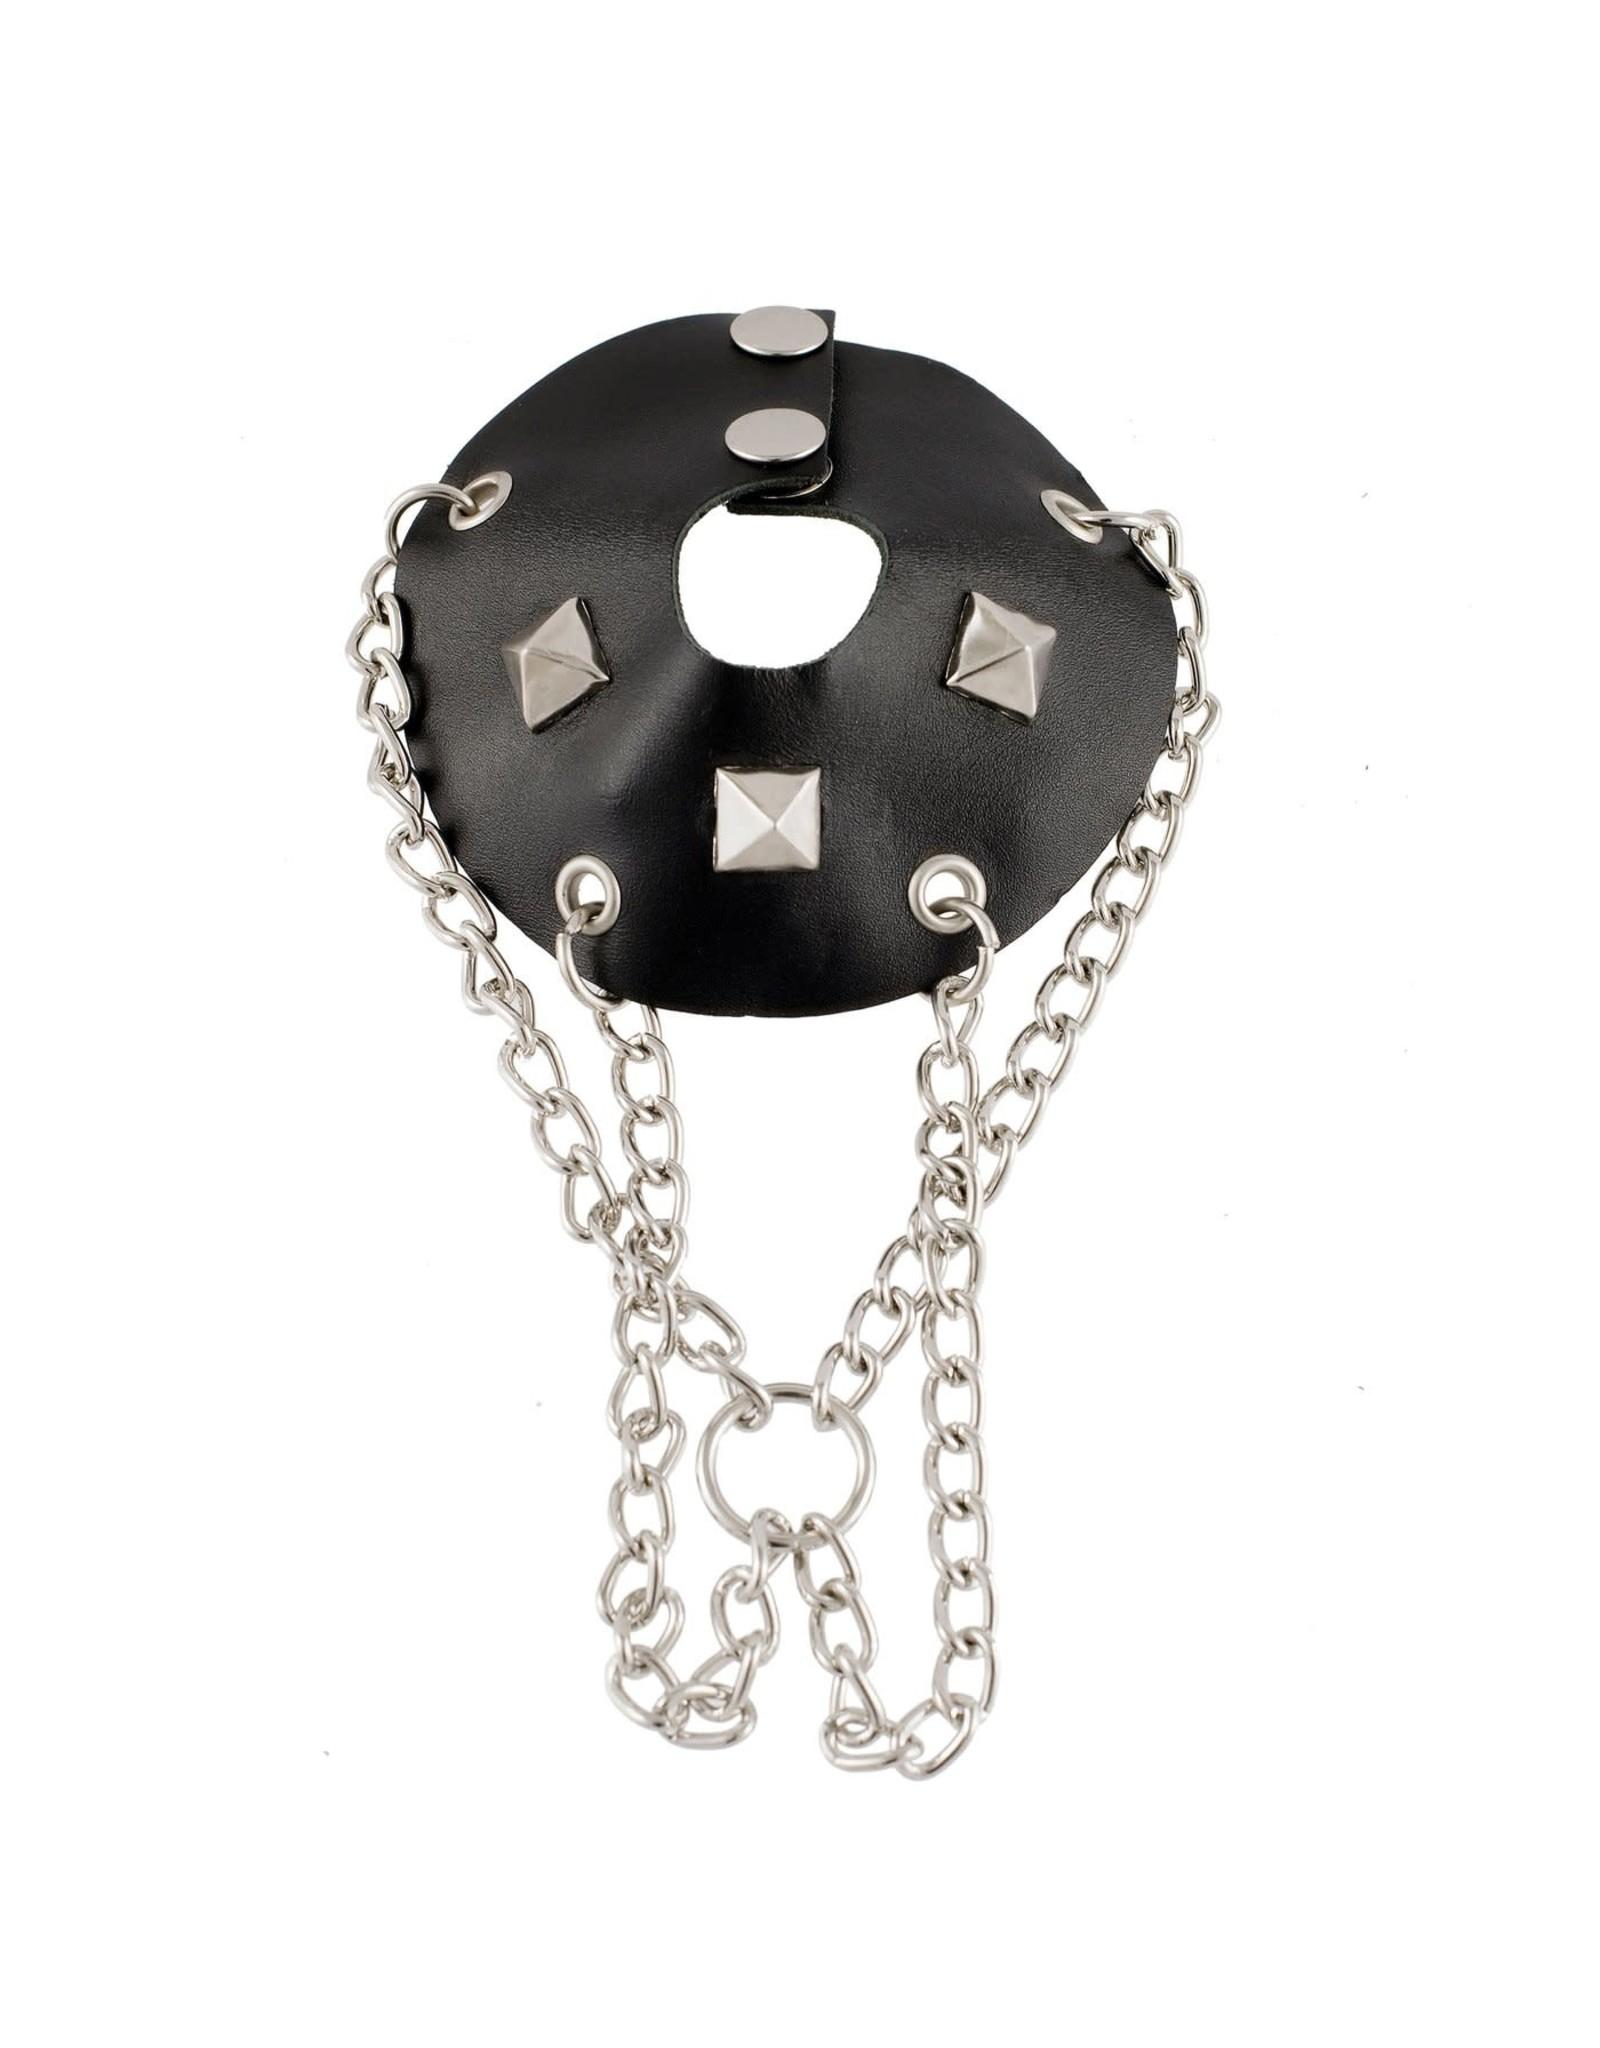 Ignite Ignite Parachute Ball Collar with Chain